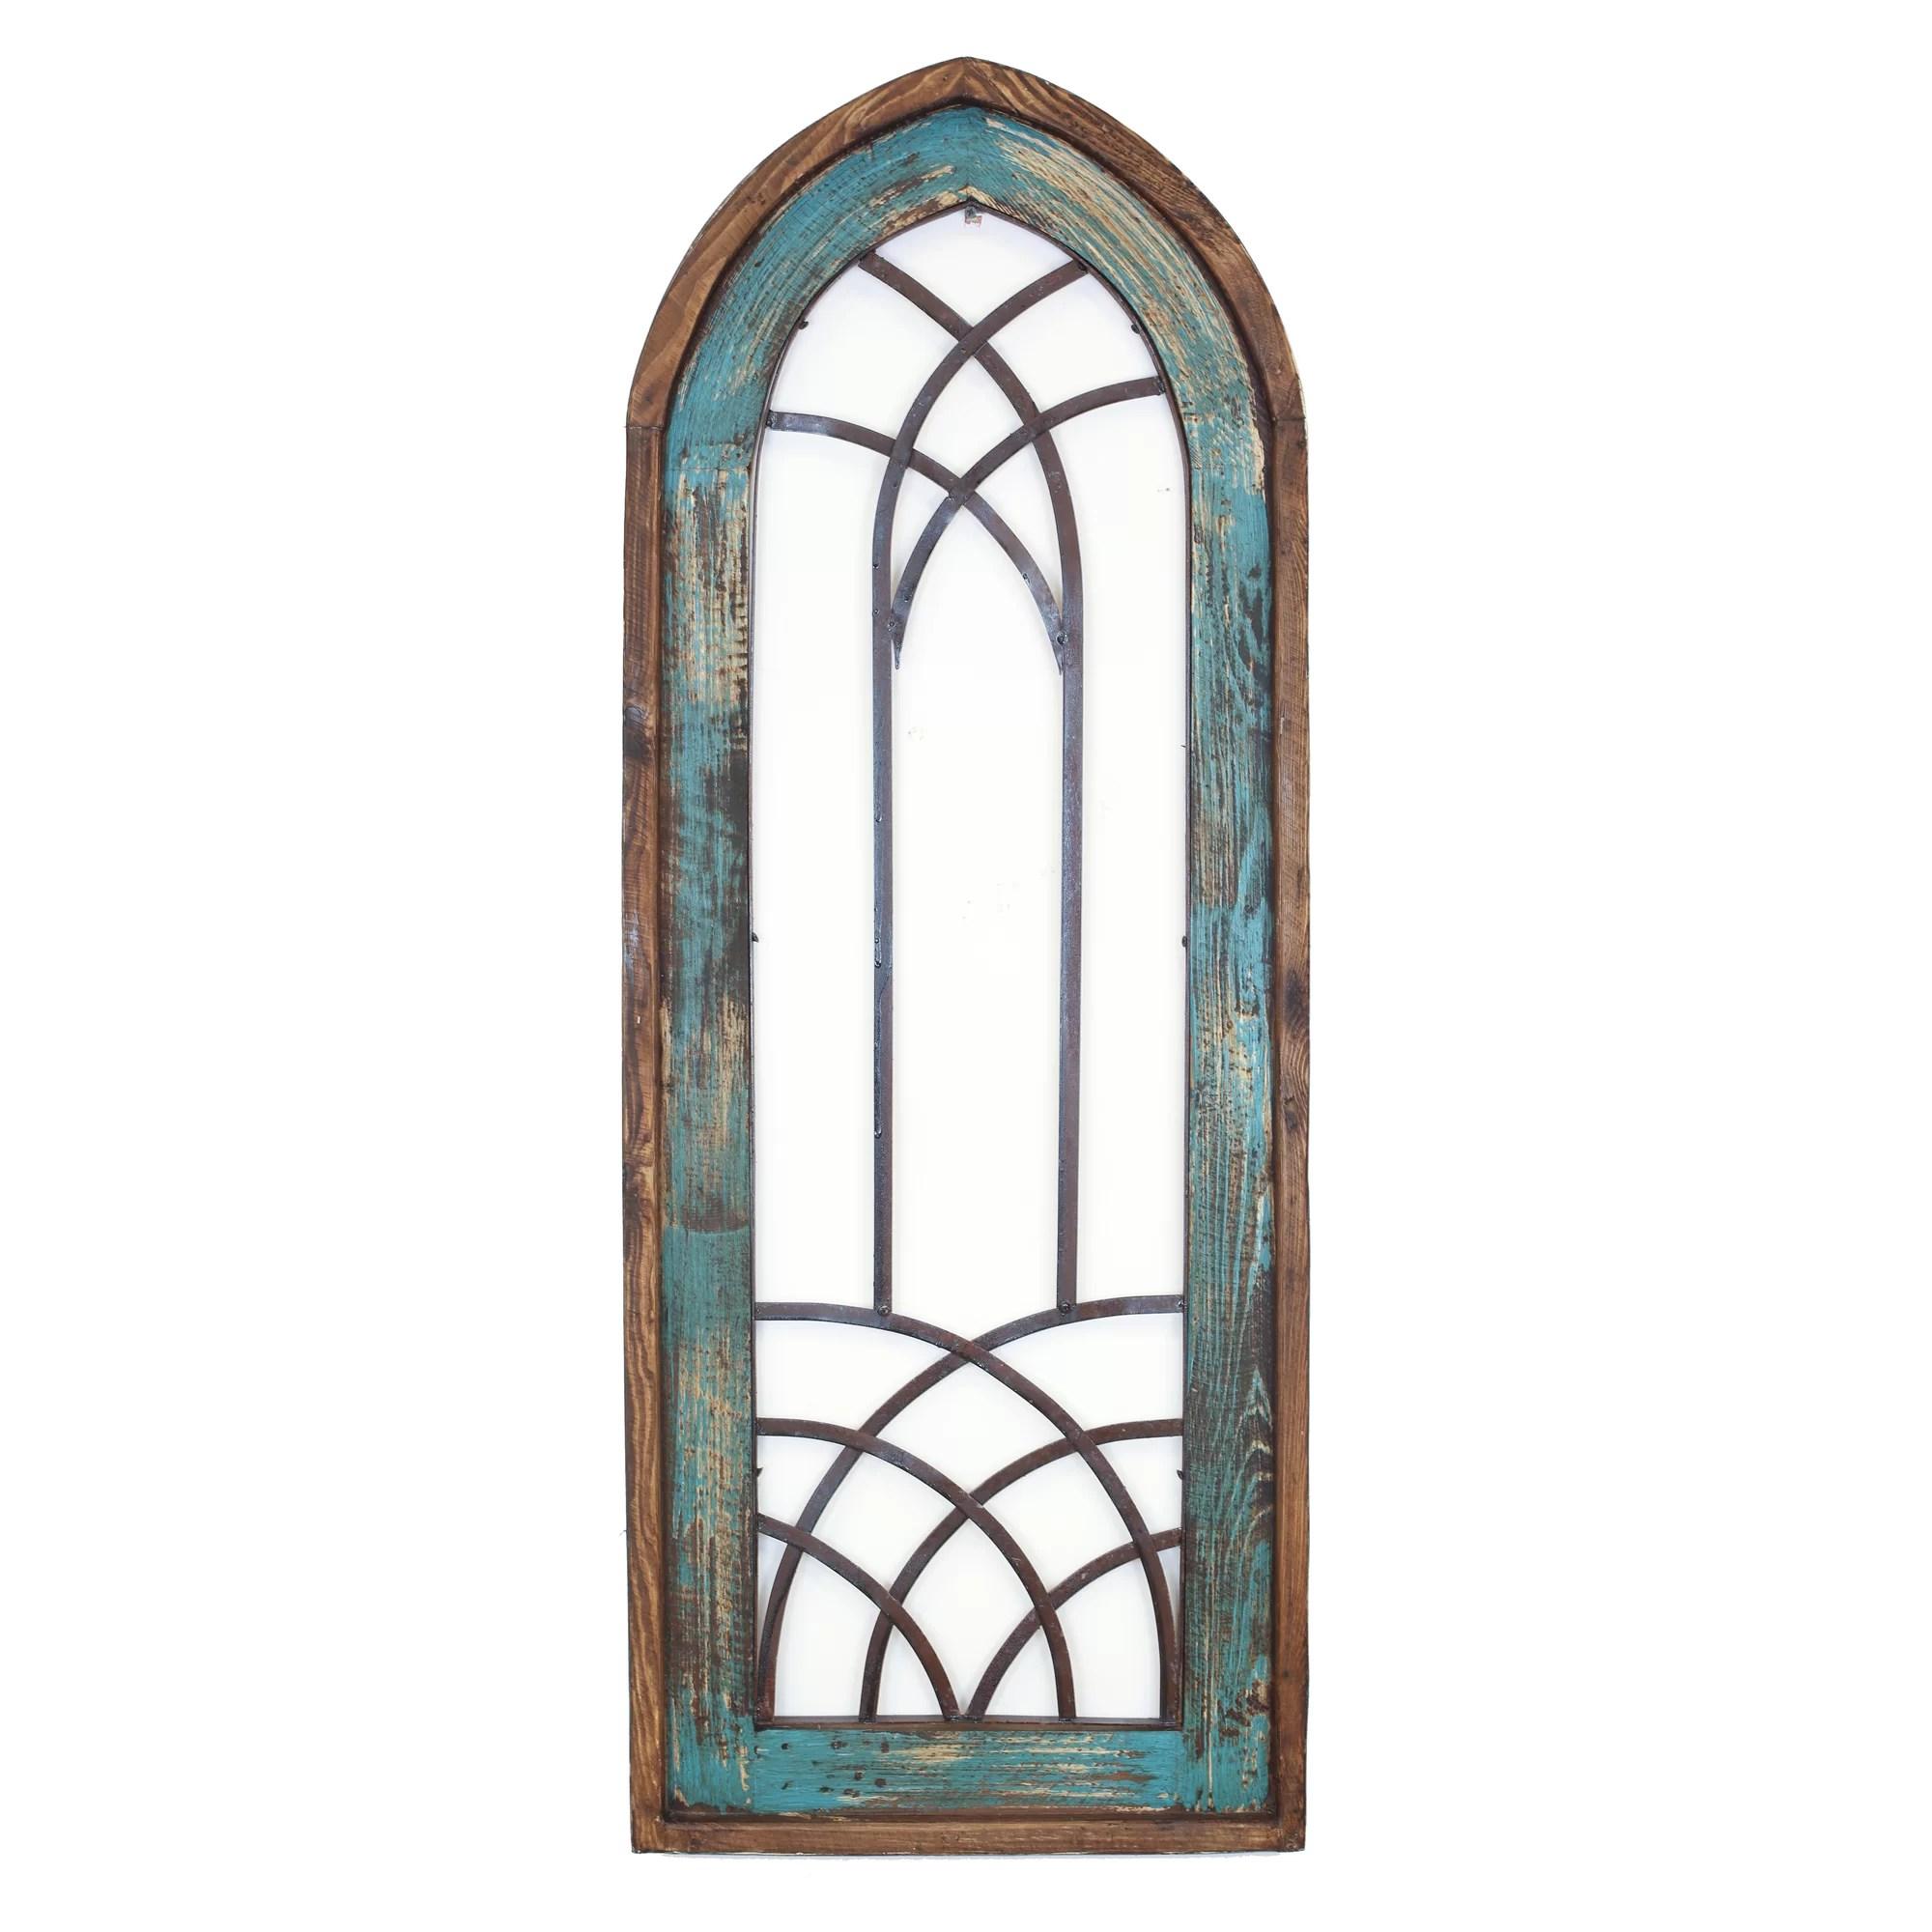 MyAmigosImports Valeria Architectural Window Wall Decor